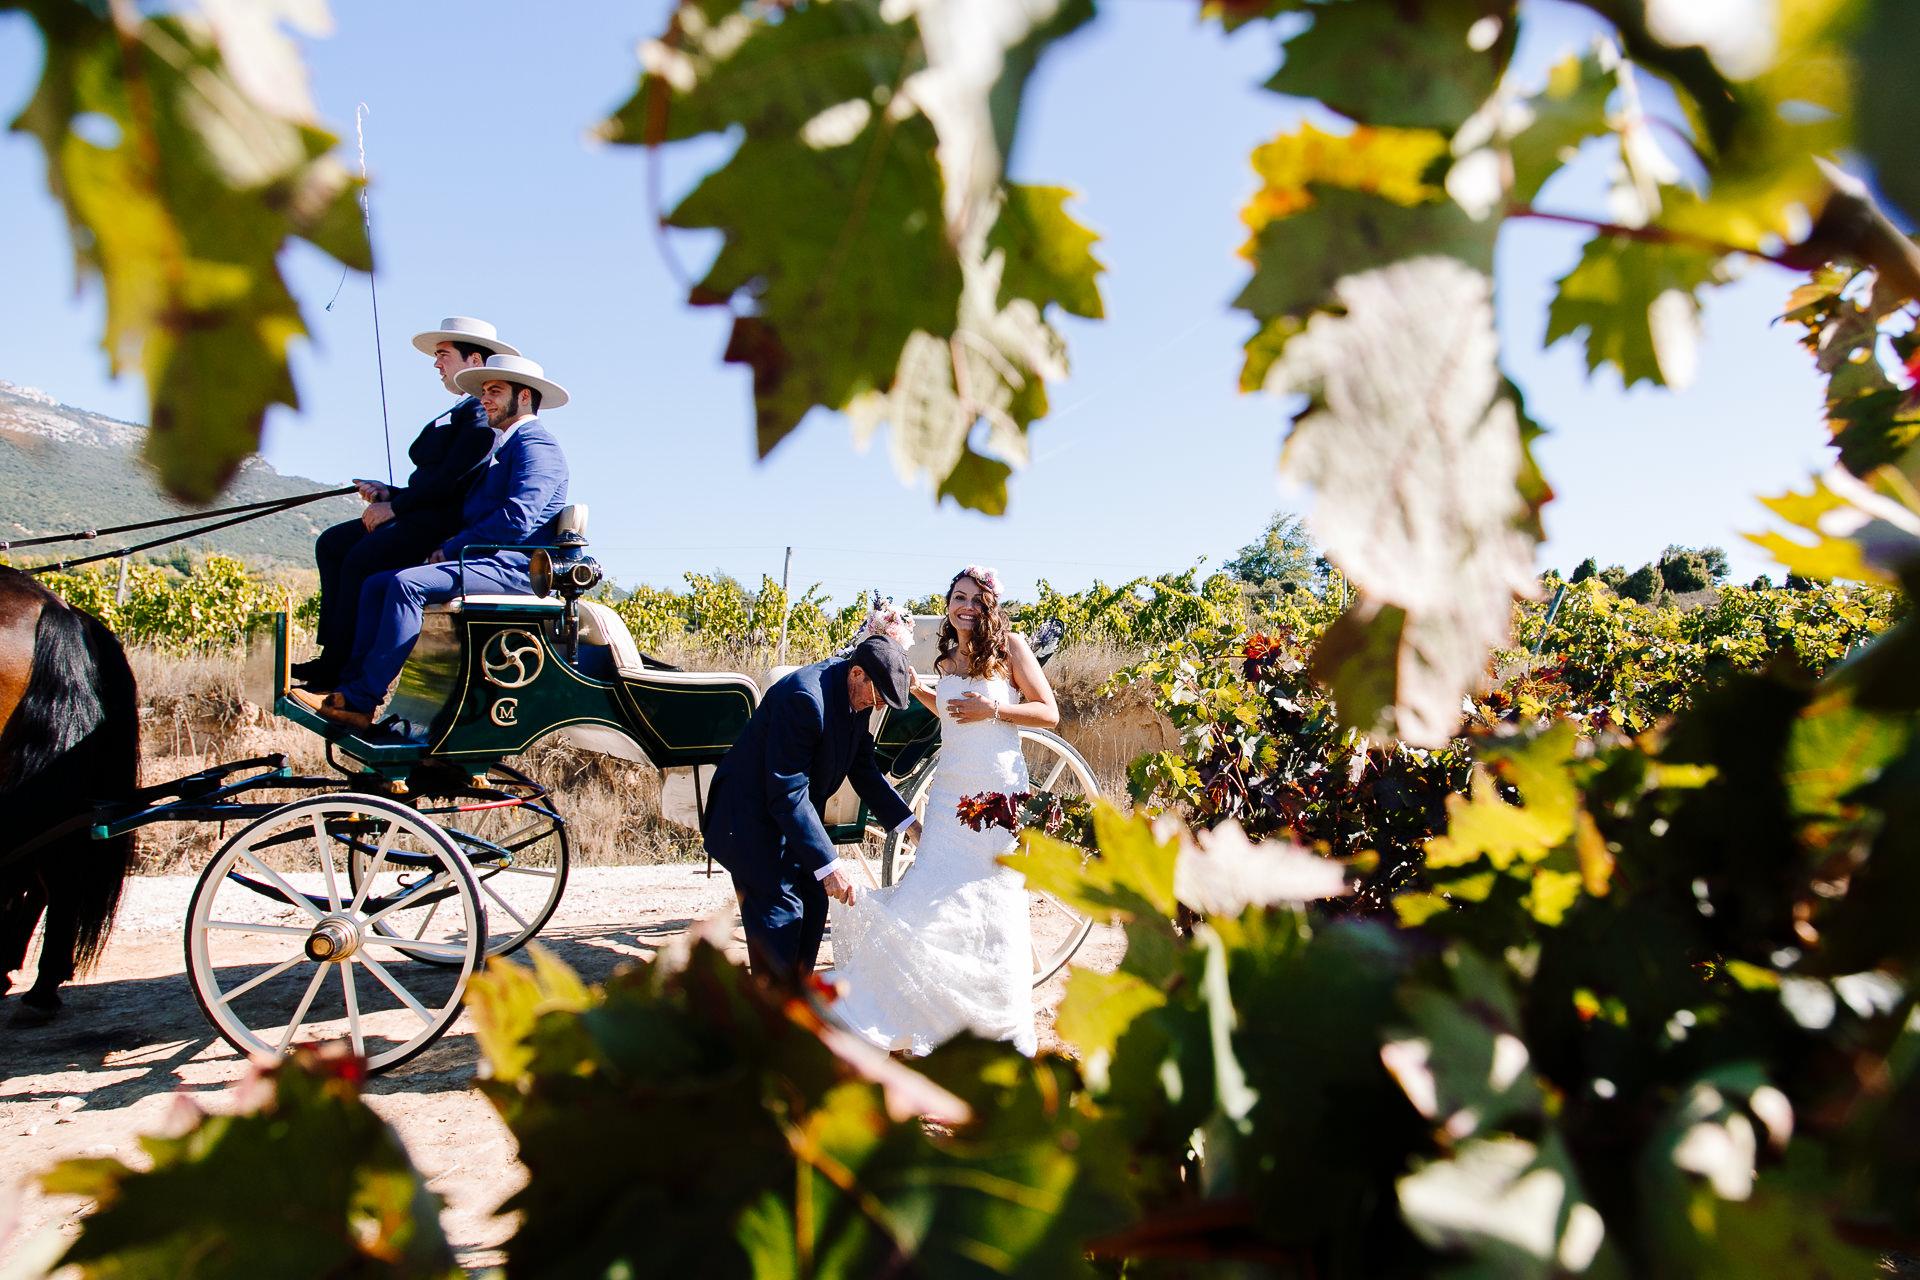 boda civil vinedos larioja lola berantevilla 133026